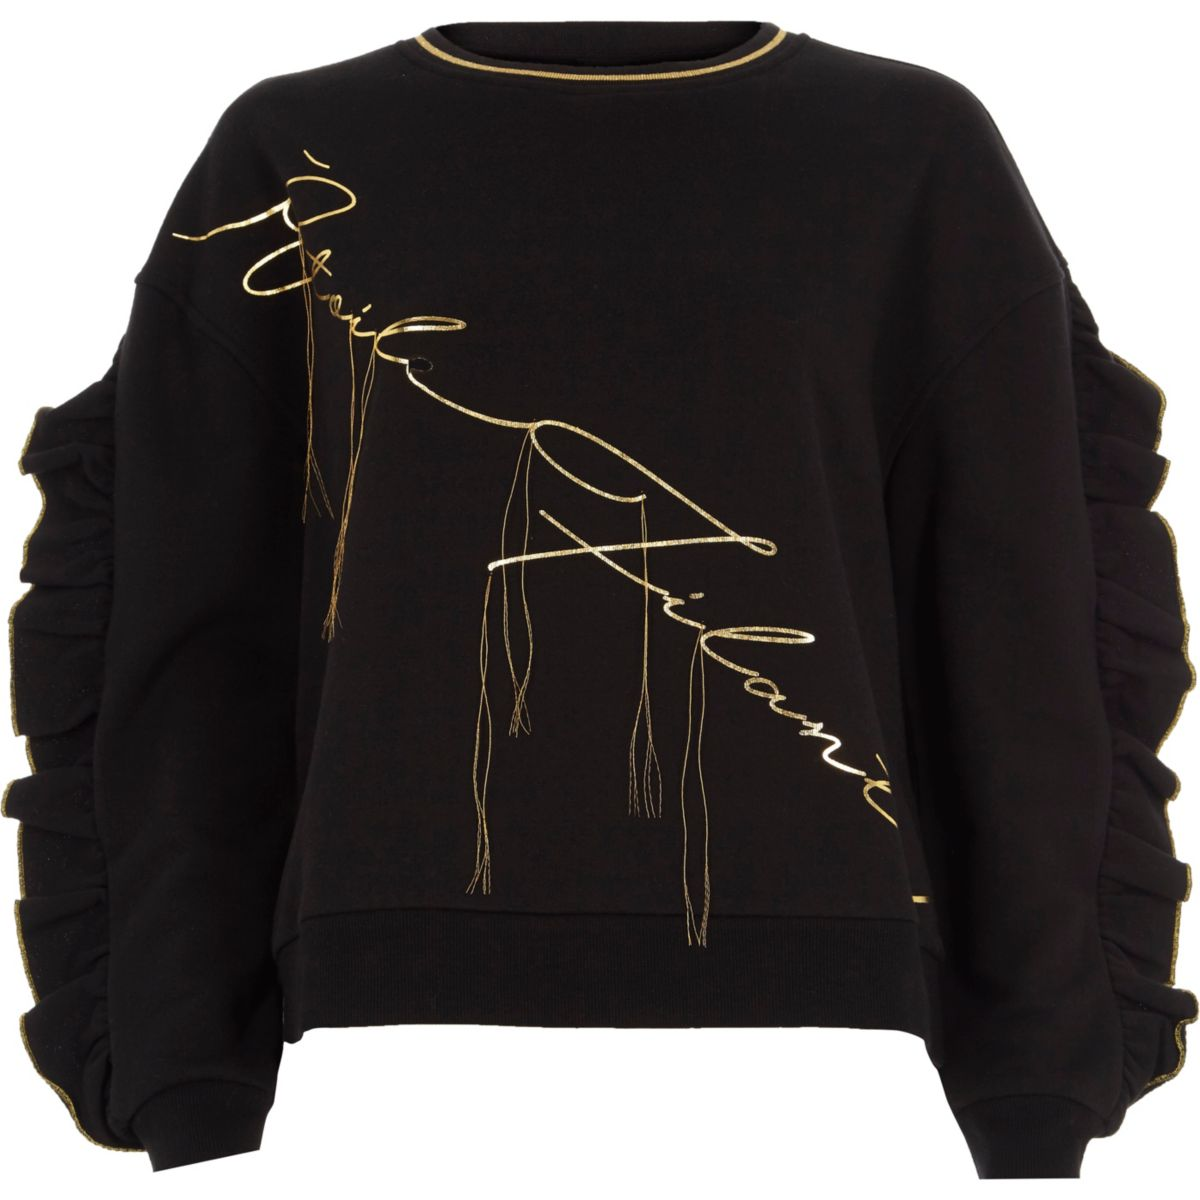 Black 'etoile filante' ruffle sweatshirt